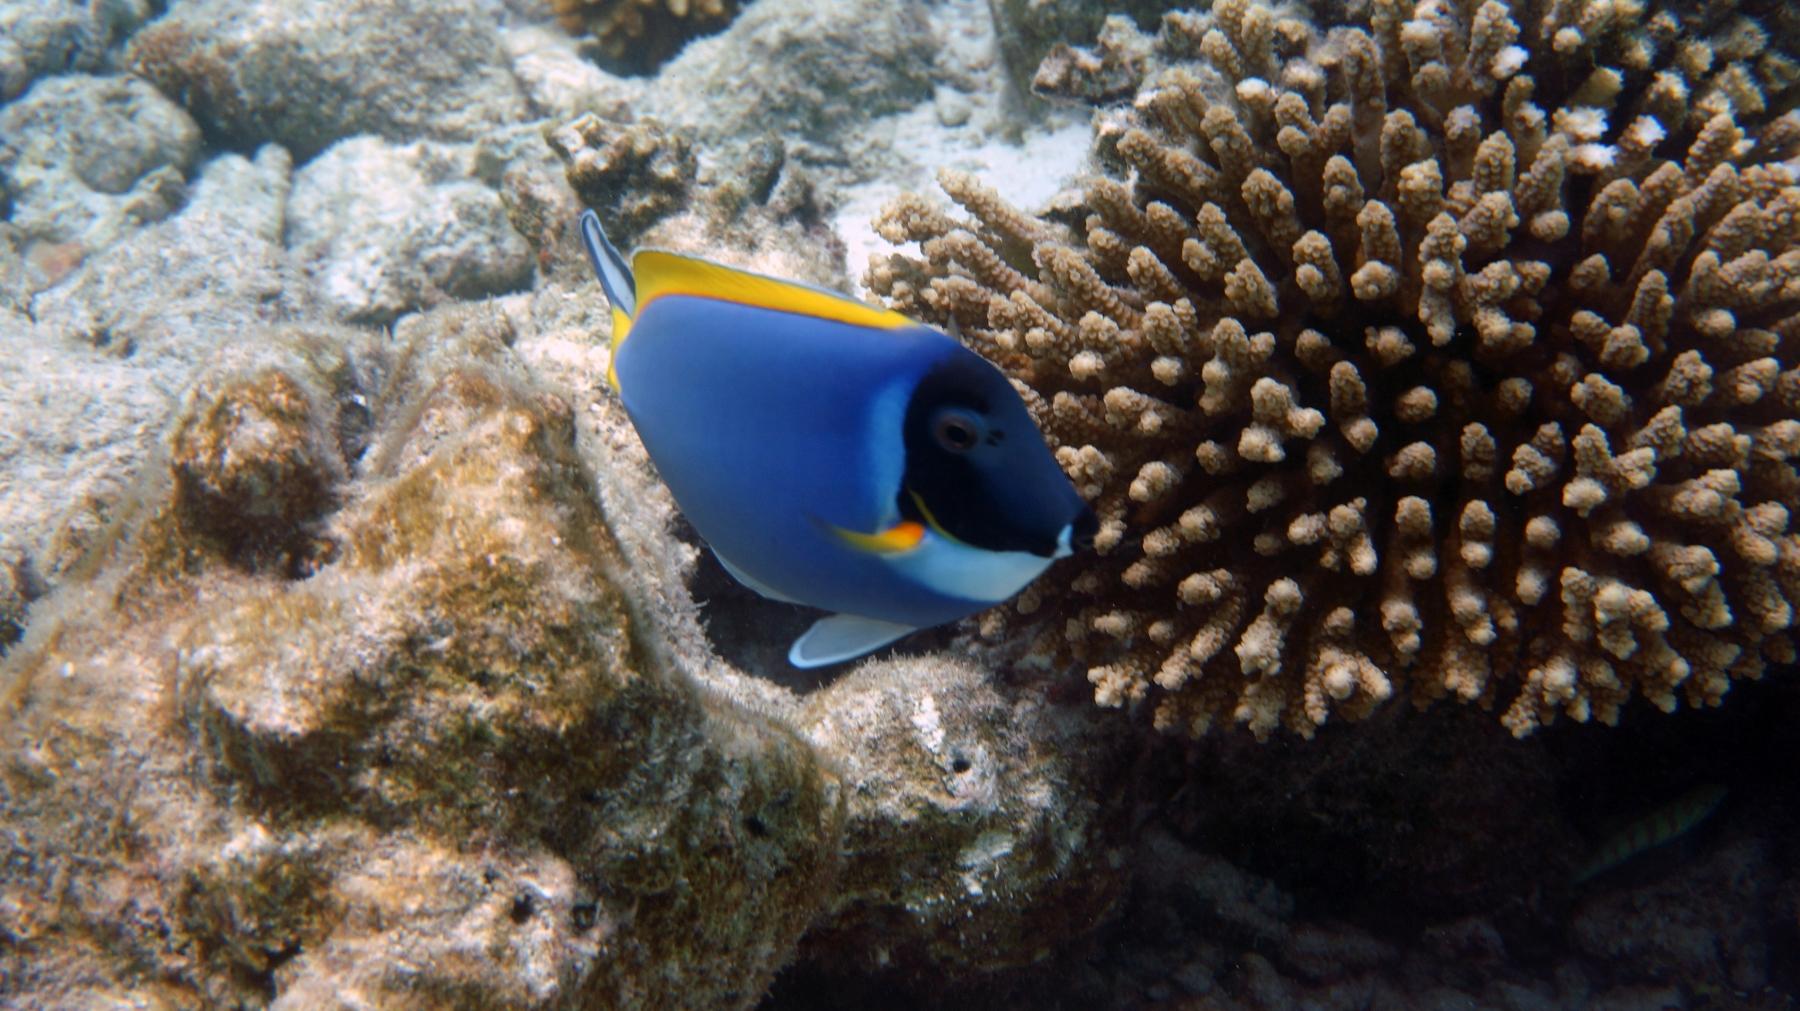 Acanthurus_leucosternon_014_C_Peces-Cirujano_L_Maldivas_U_Sebas_04072015